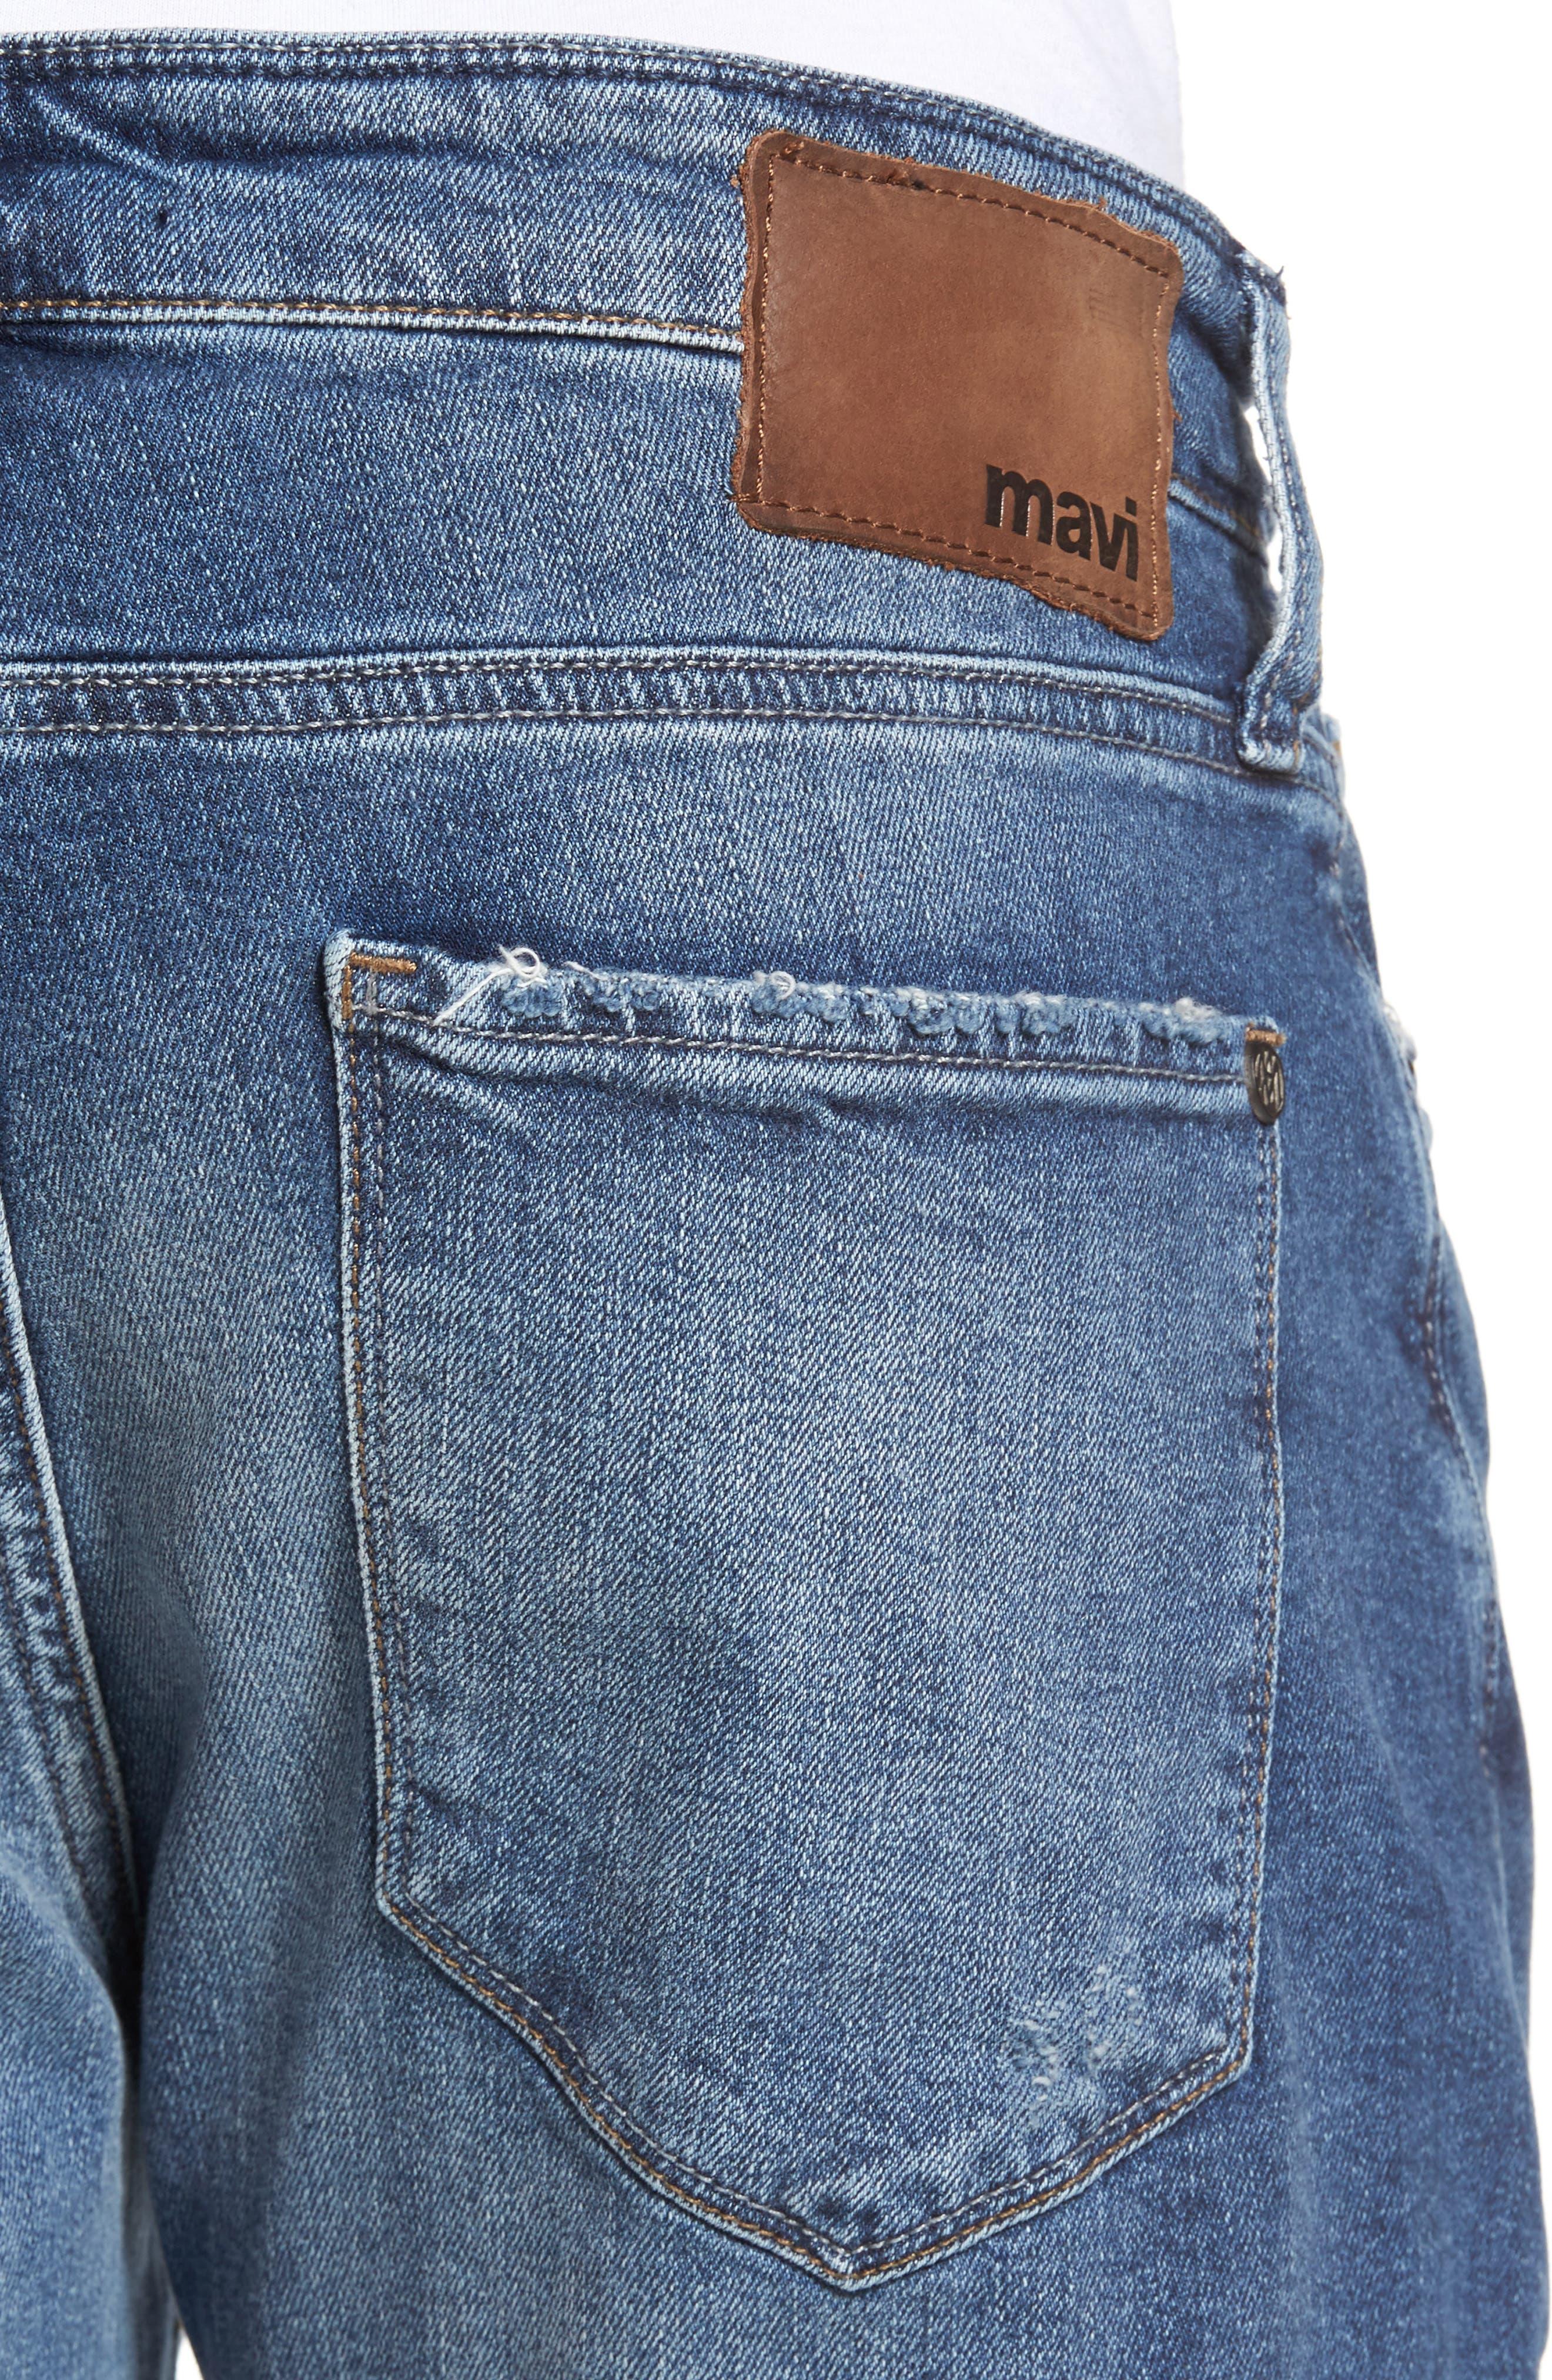 Marcus Slim Straight Leg Jeans,                             Alternate thumbnail 4, color,                             420